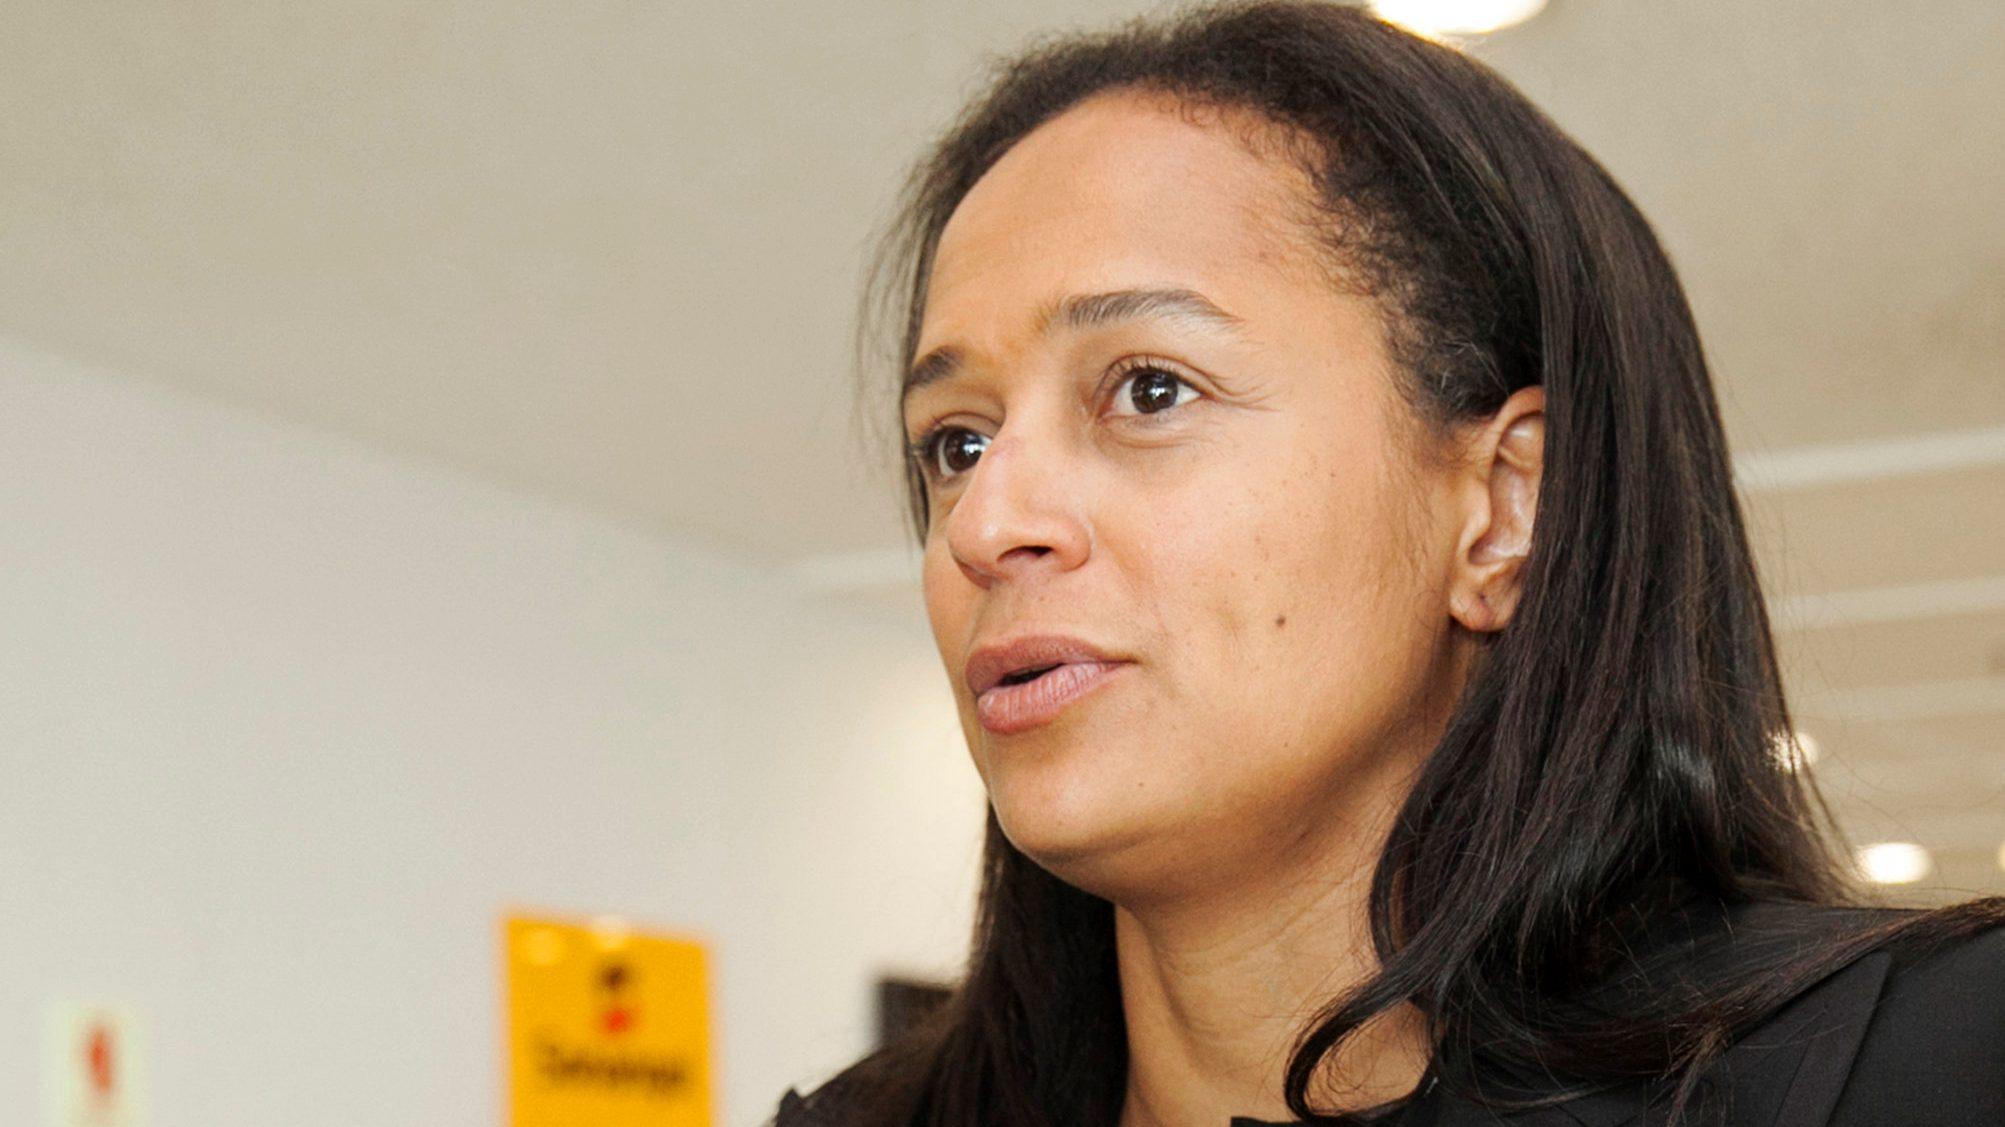 Isabel dos Santos, the daughter of Angolan President Eduardo dos Santos, speaks during an interview in Luanda